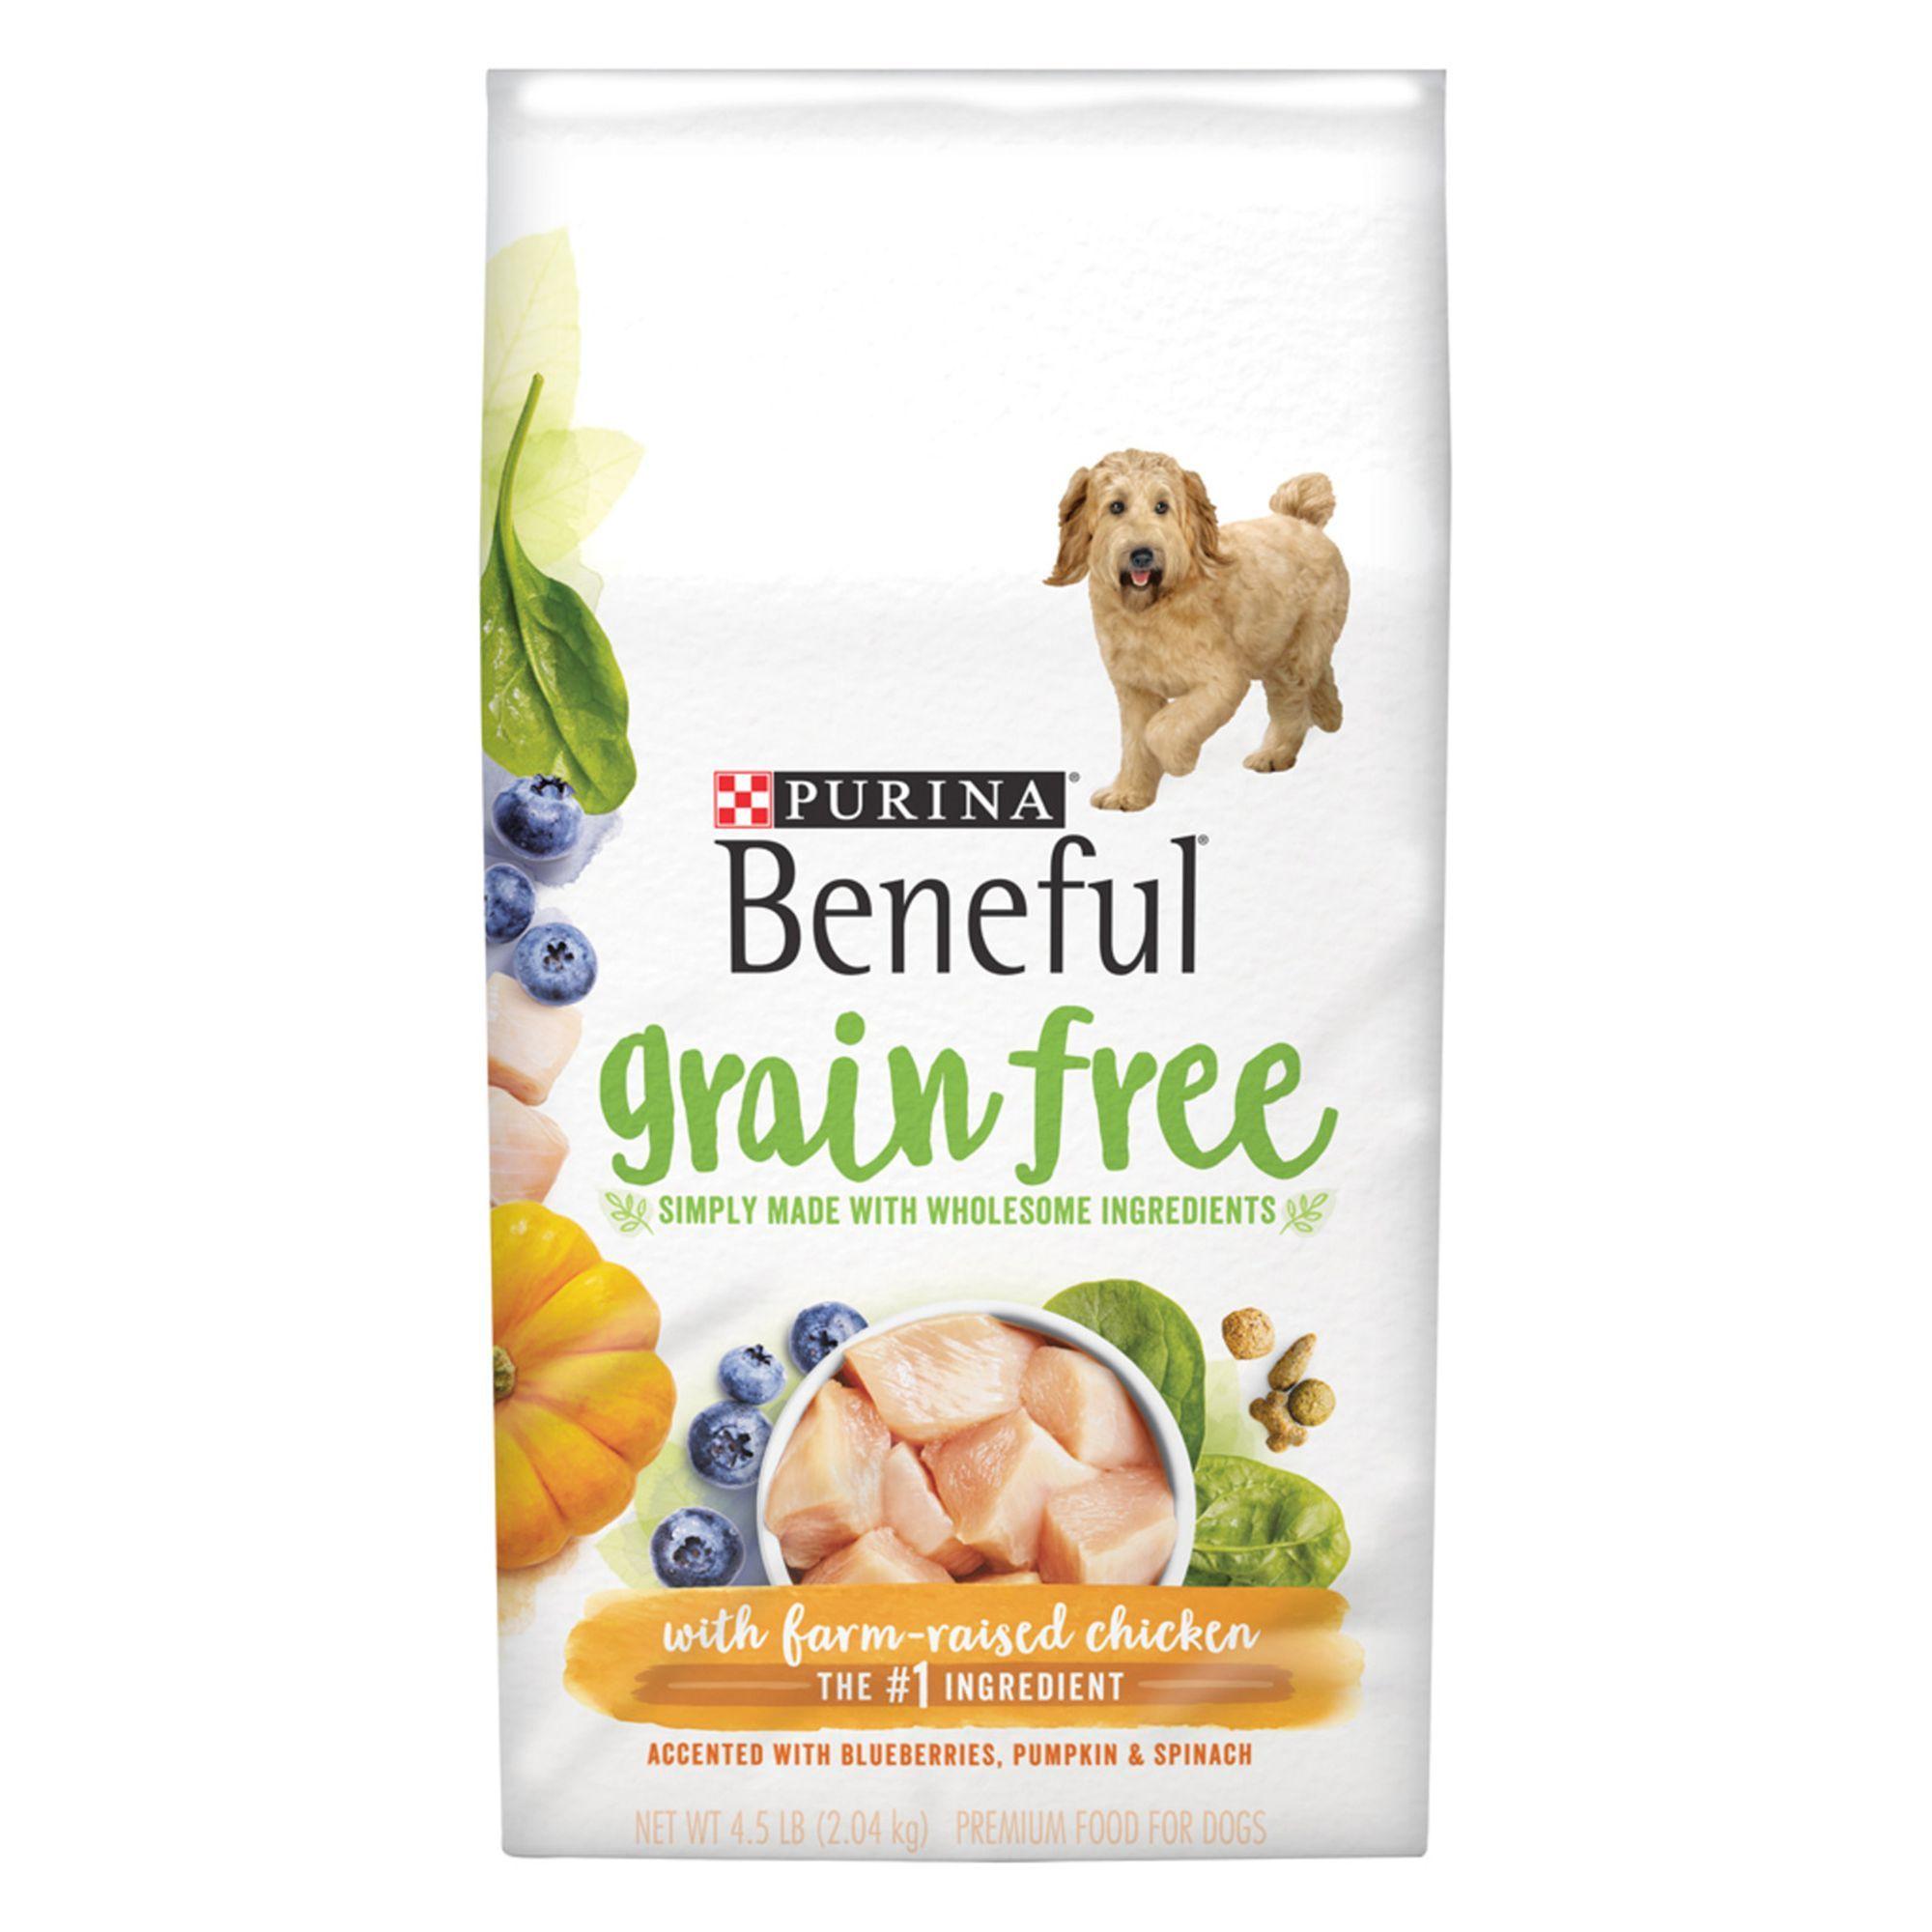 Purina Beneful Adult Dog Food Grain Free Gluten Free Chicken